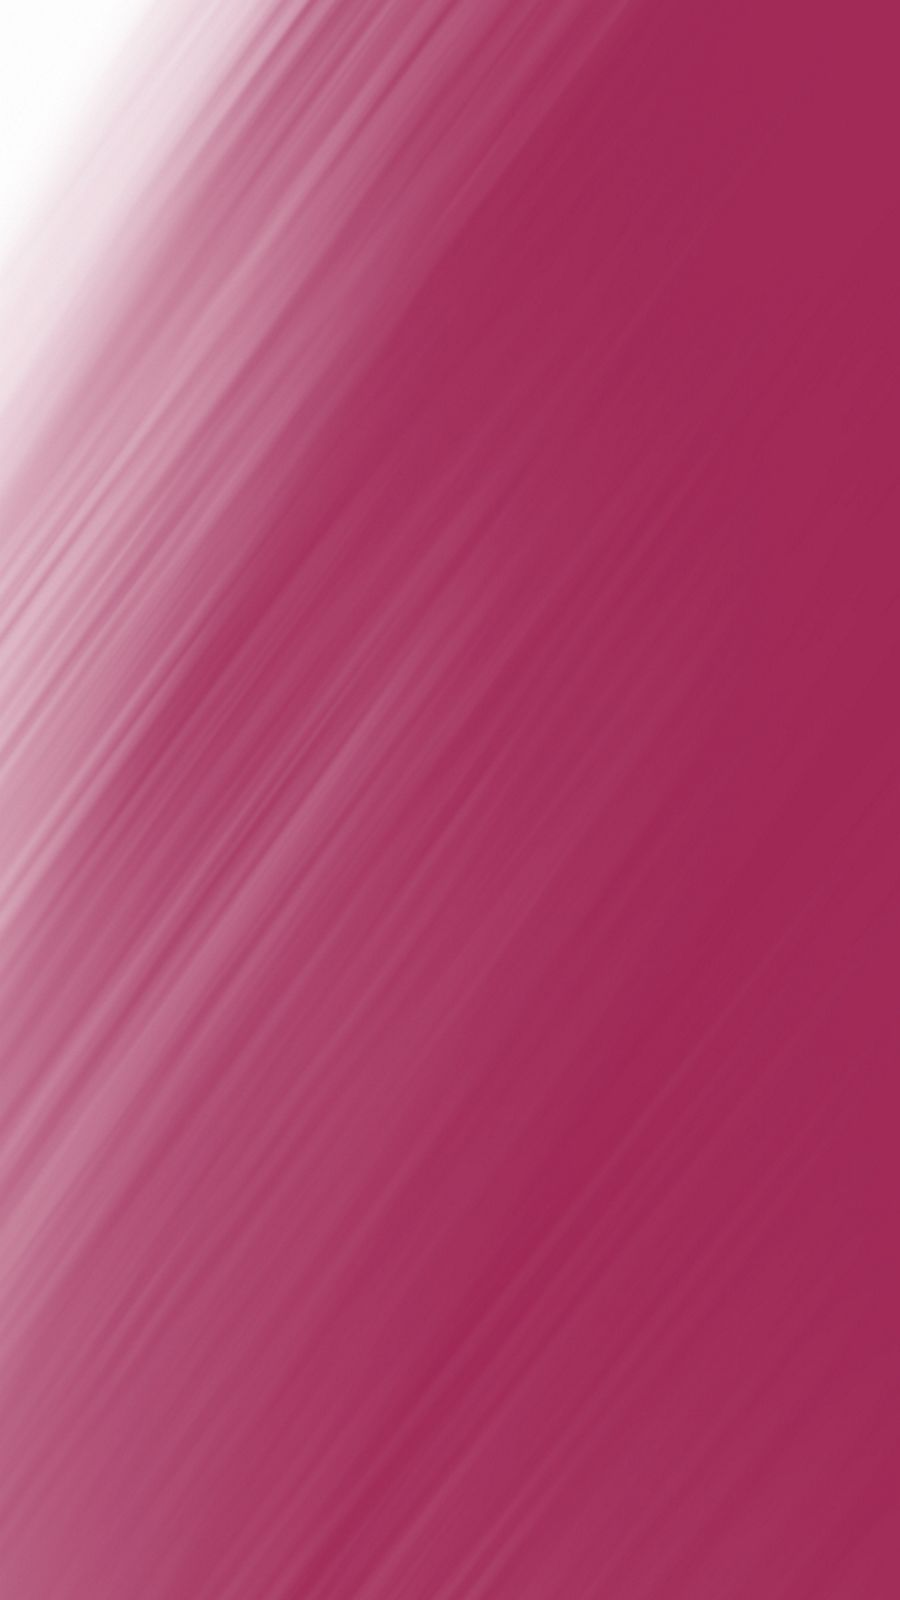 Pink azalea 03 Fresh Glow Blush – Pink Azalea No.03 - Image 2